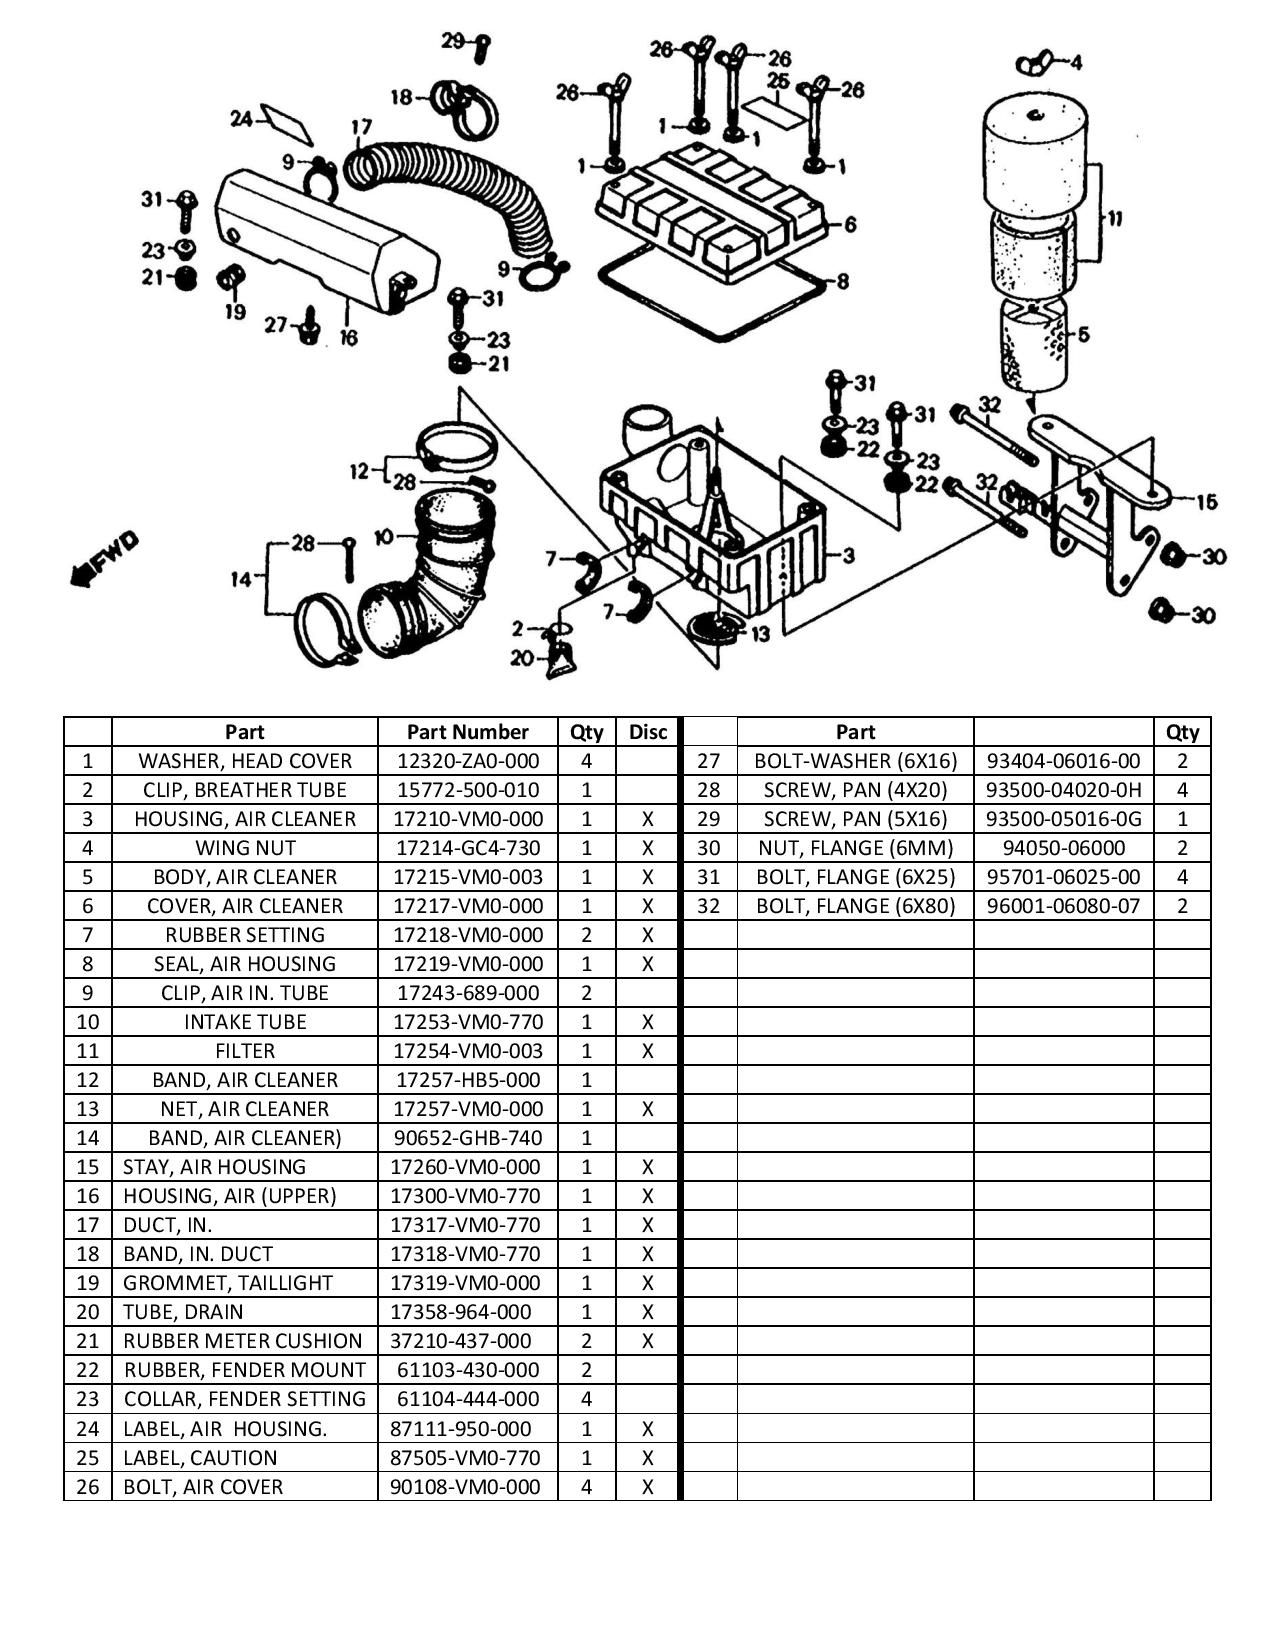 2011 Honda Odyssey Wiring Diagram